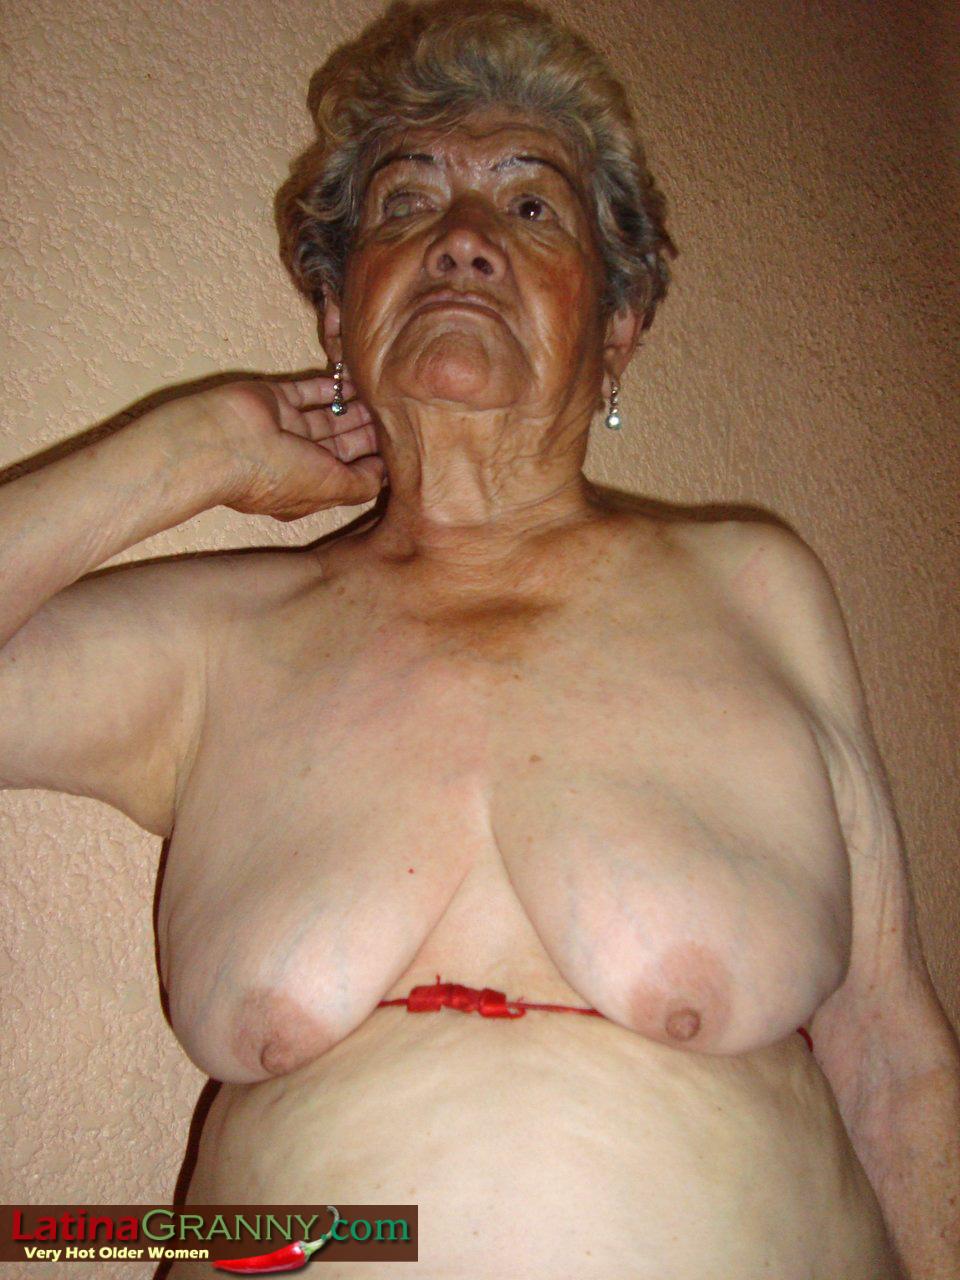 Mature latina granny nude